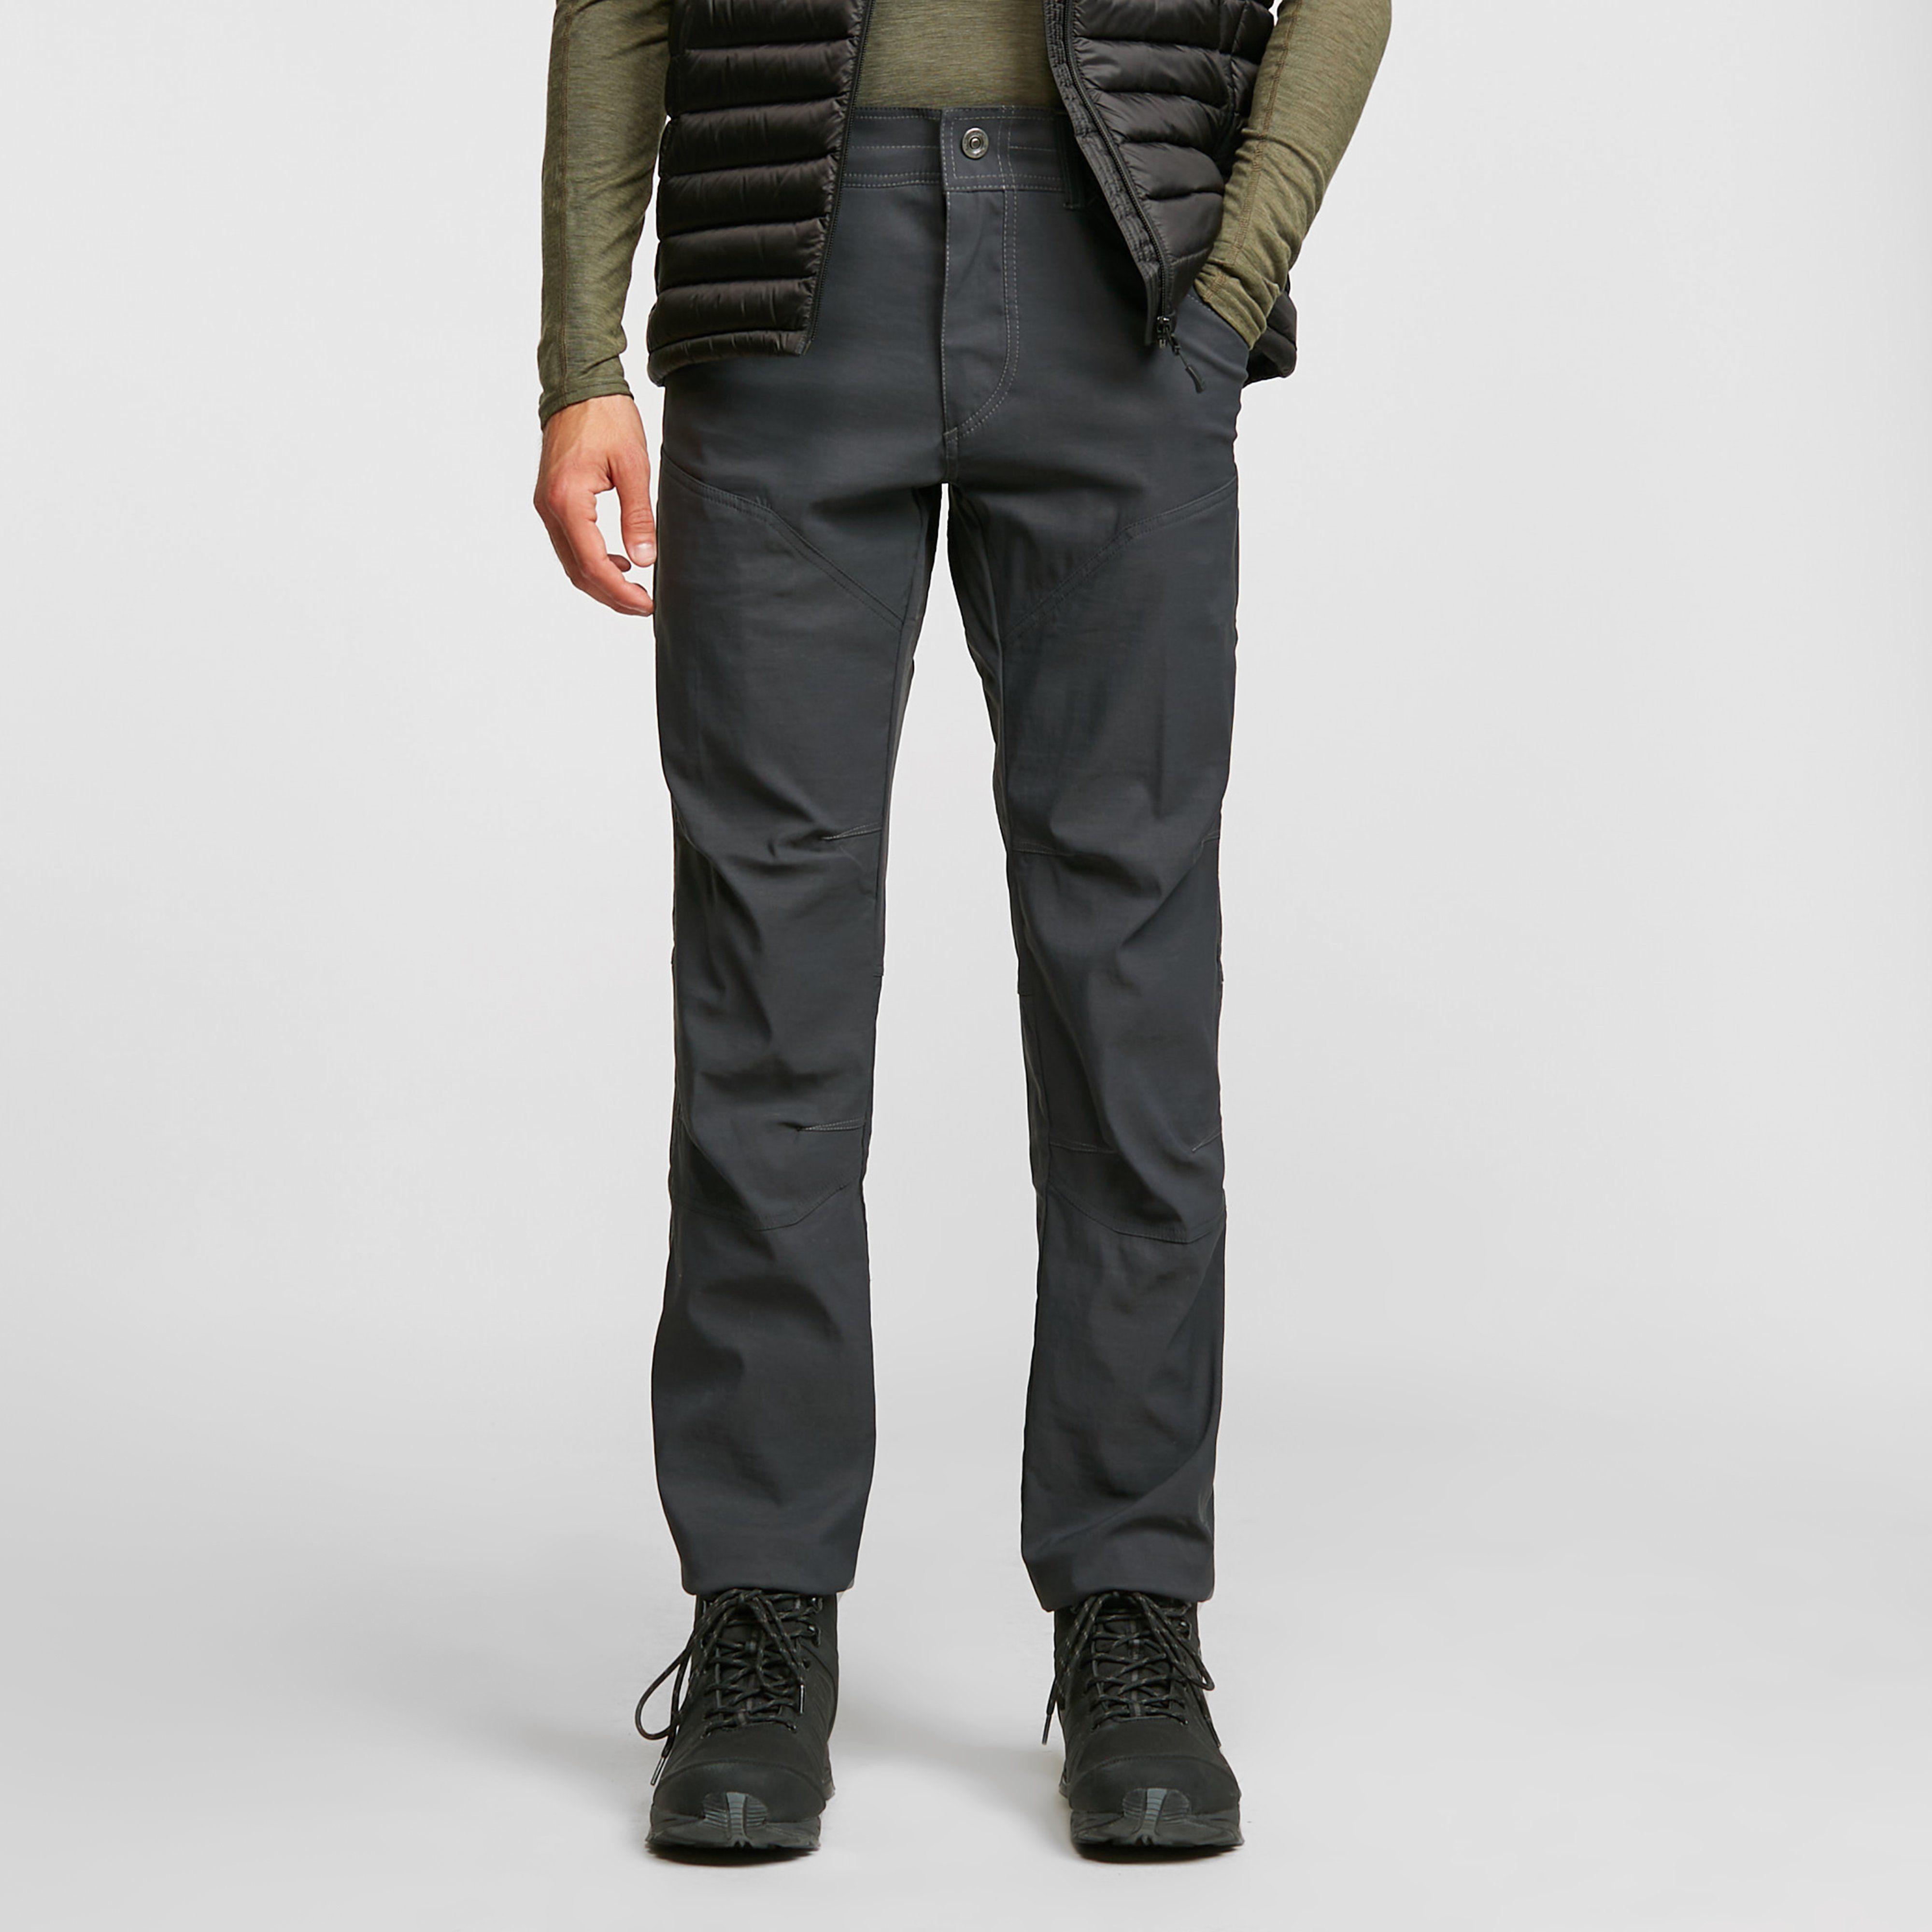 KUHL Men's Renegade Pants